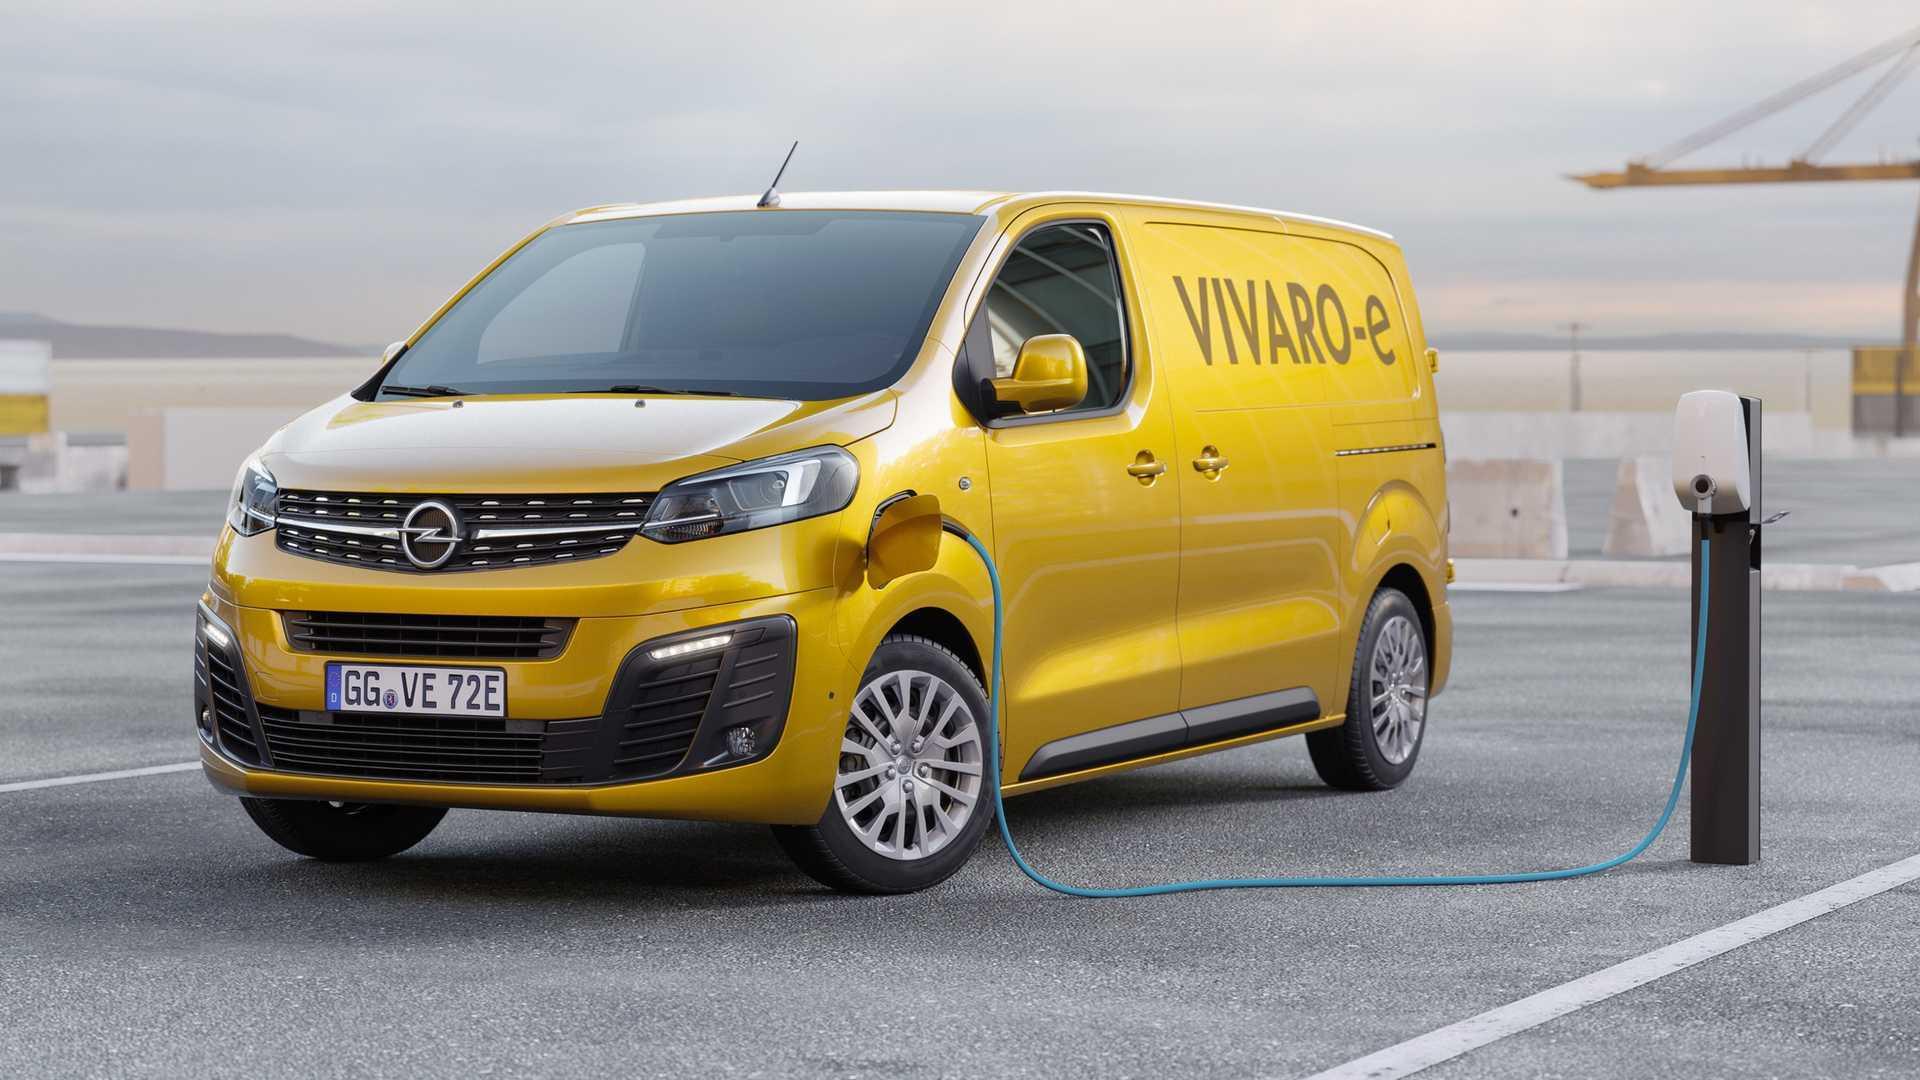 2020 Opel Vivaro Exterior